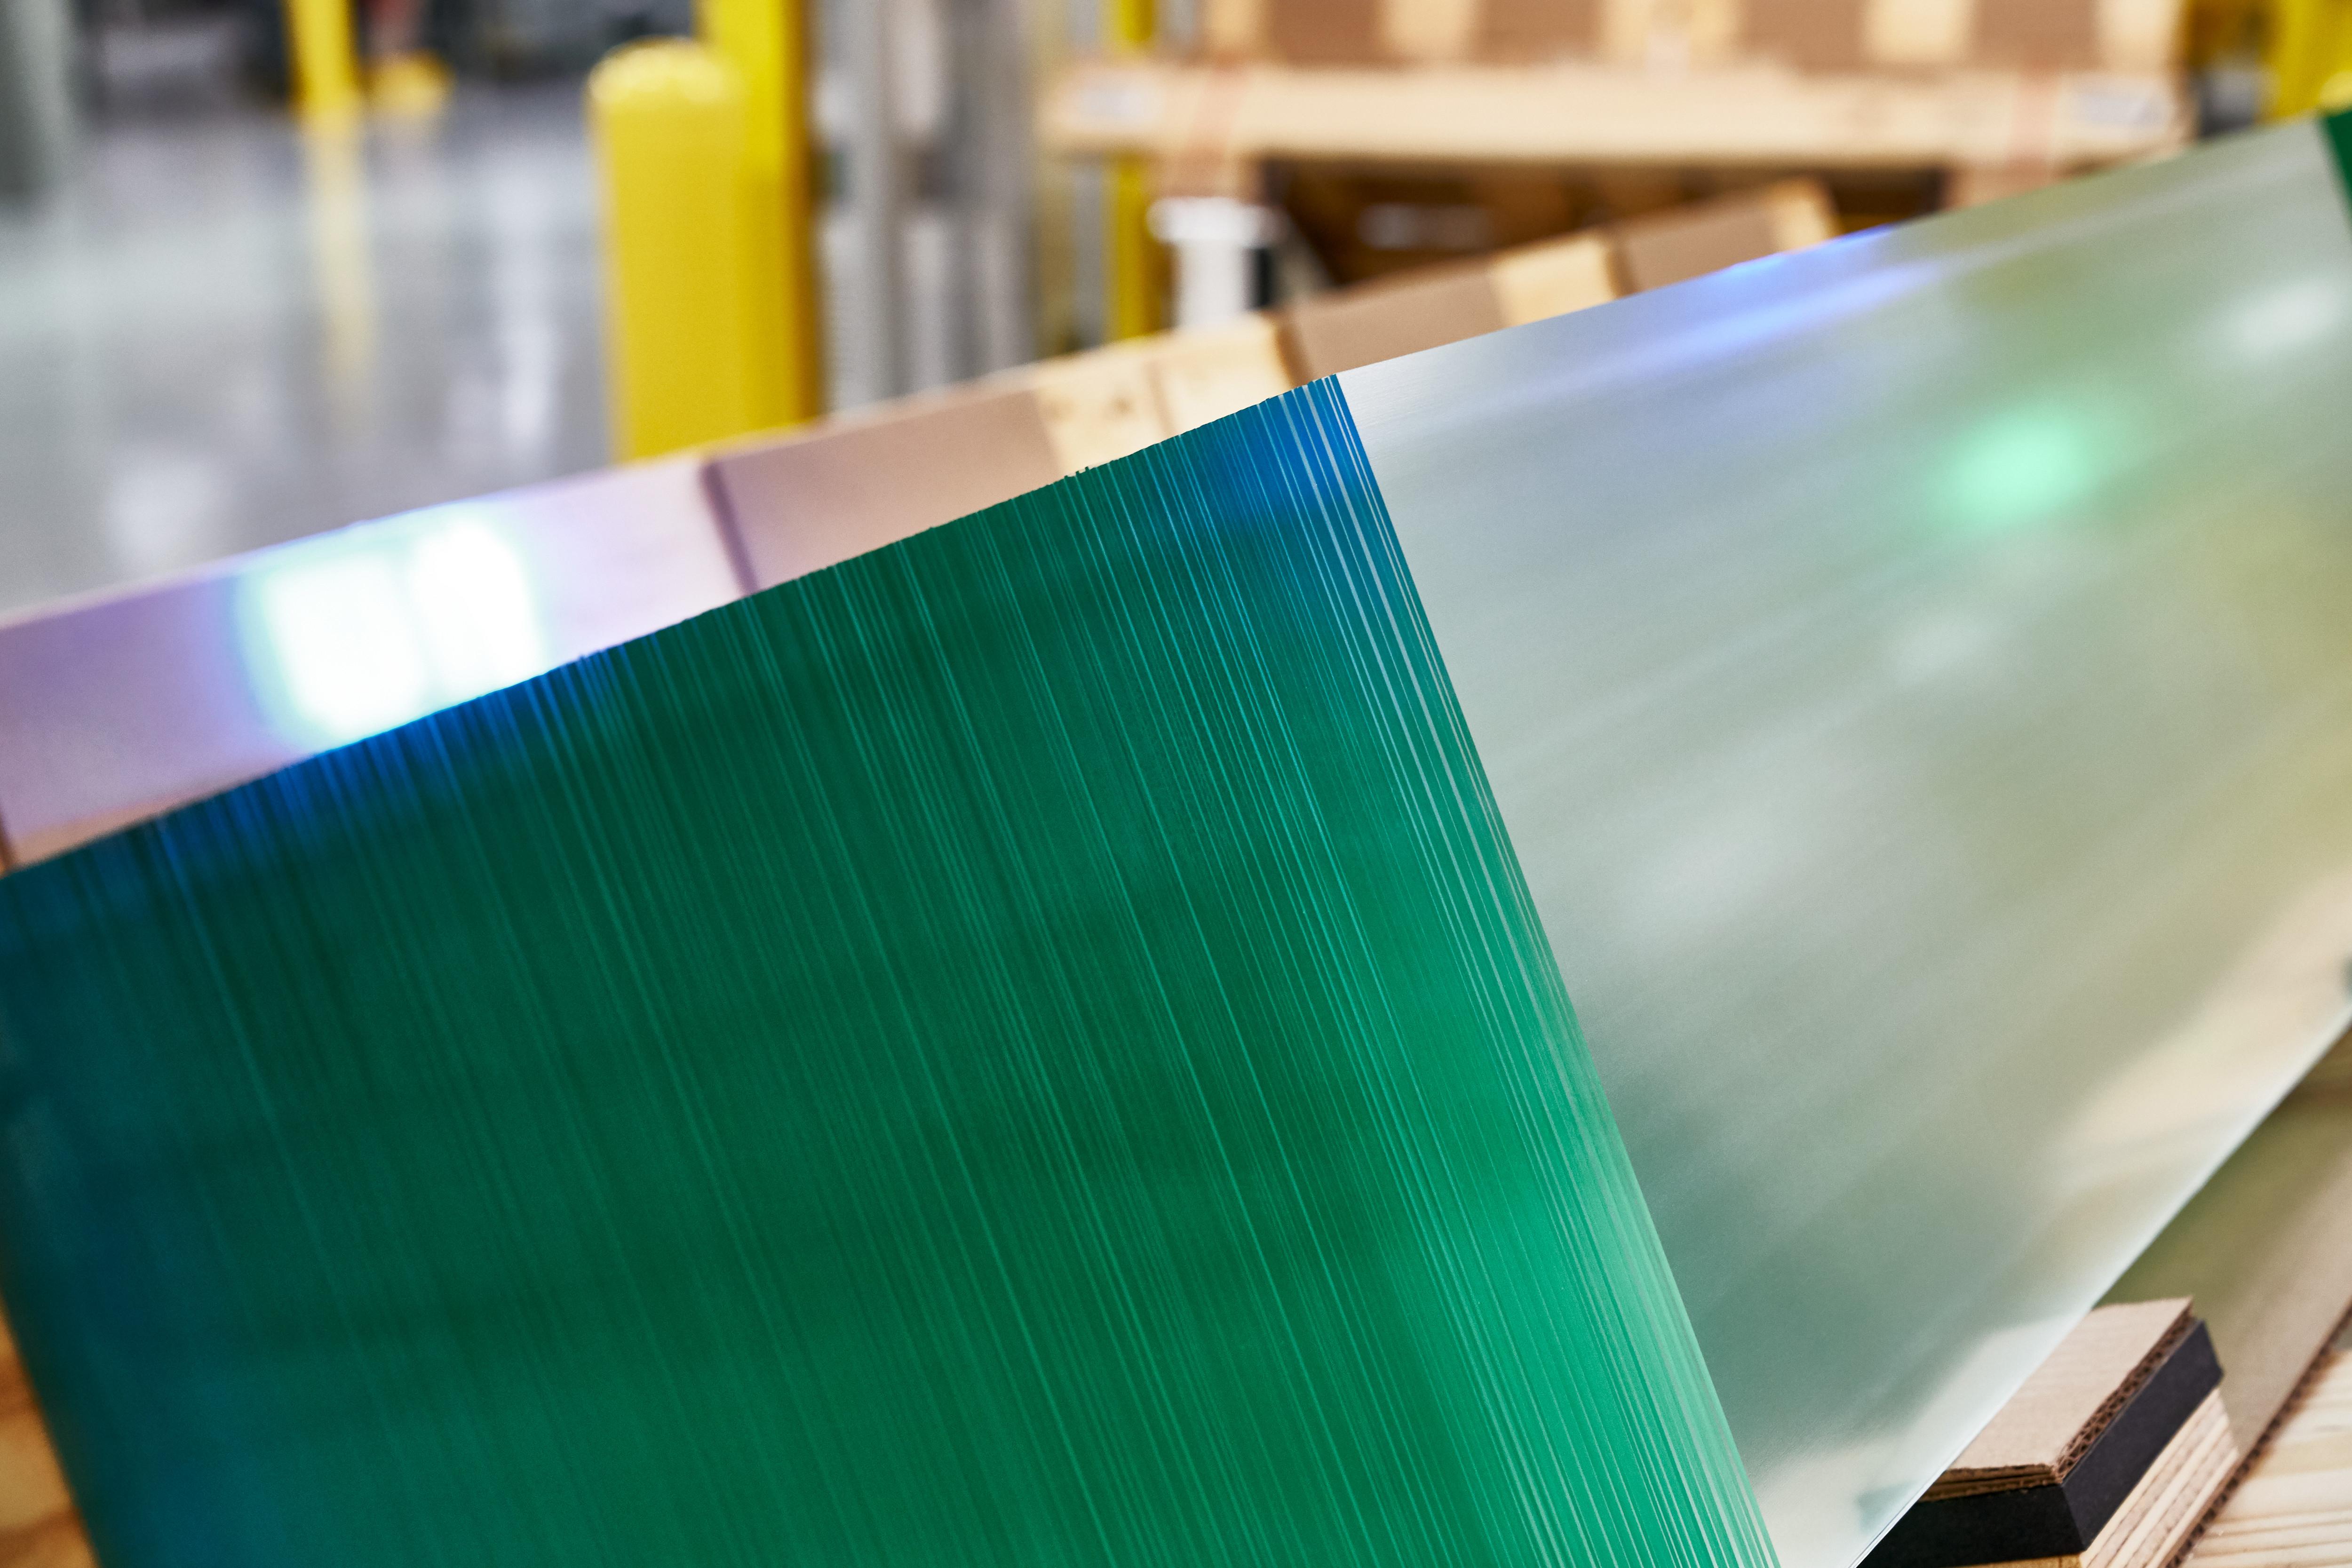 Apple Corning Harrodsburg Plant iPhone Apple Watch Glass 091719